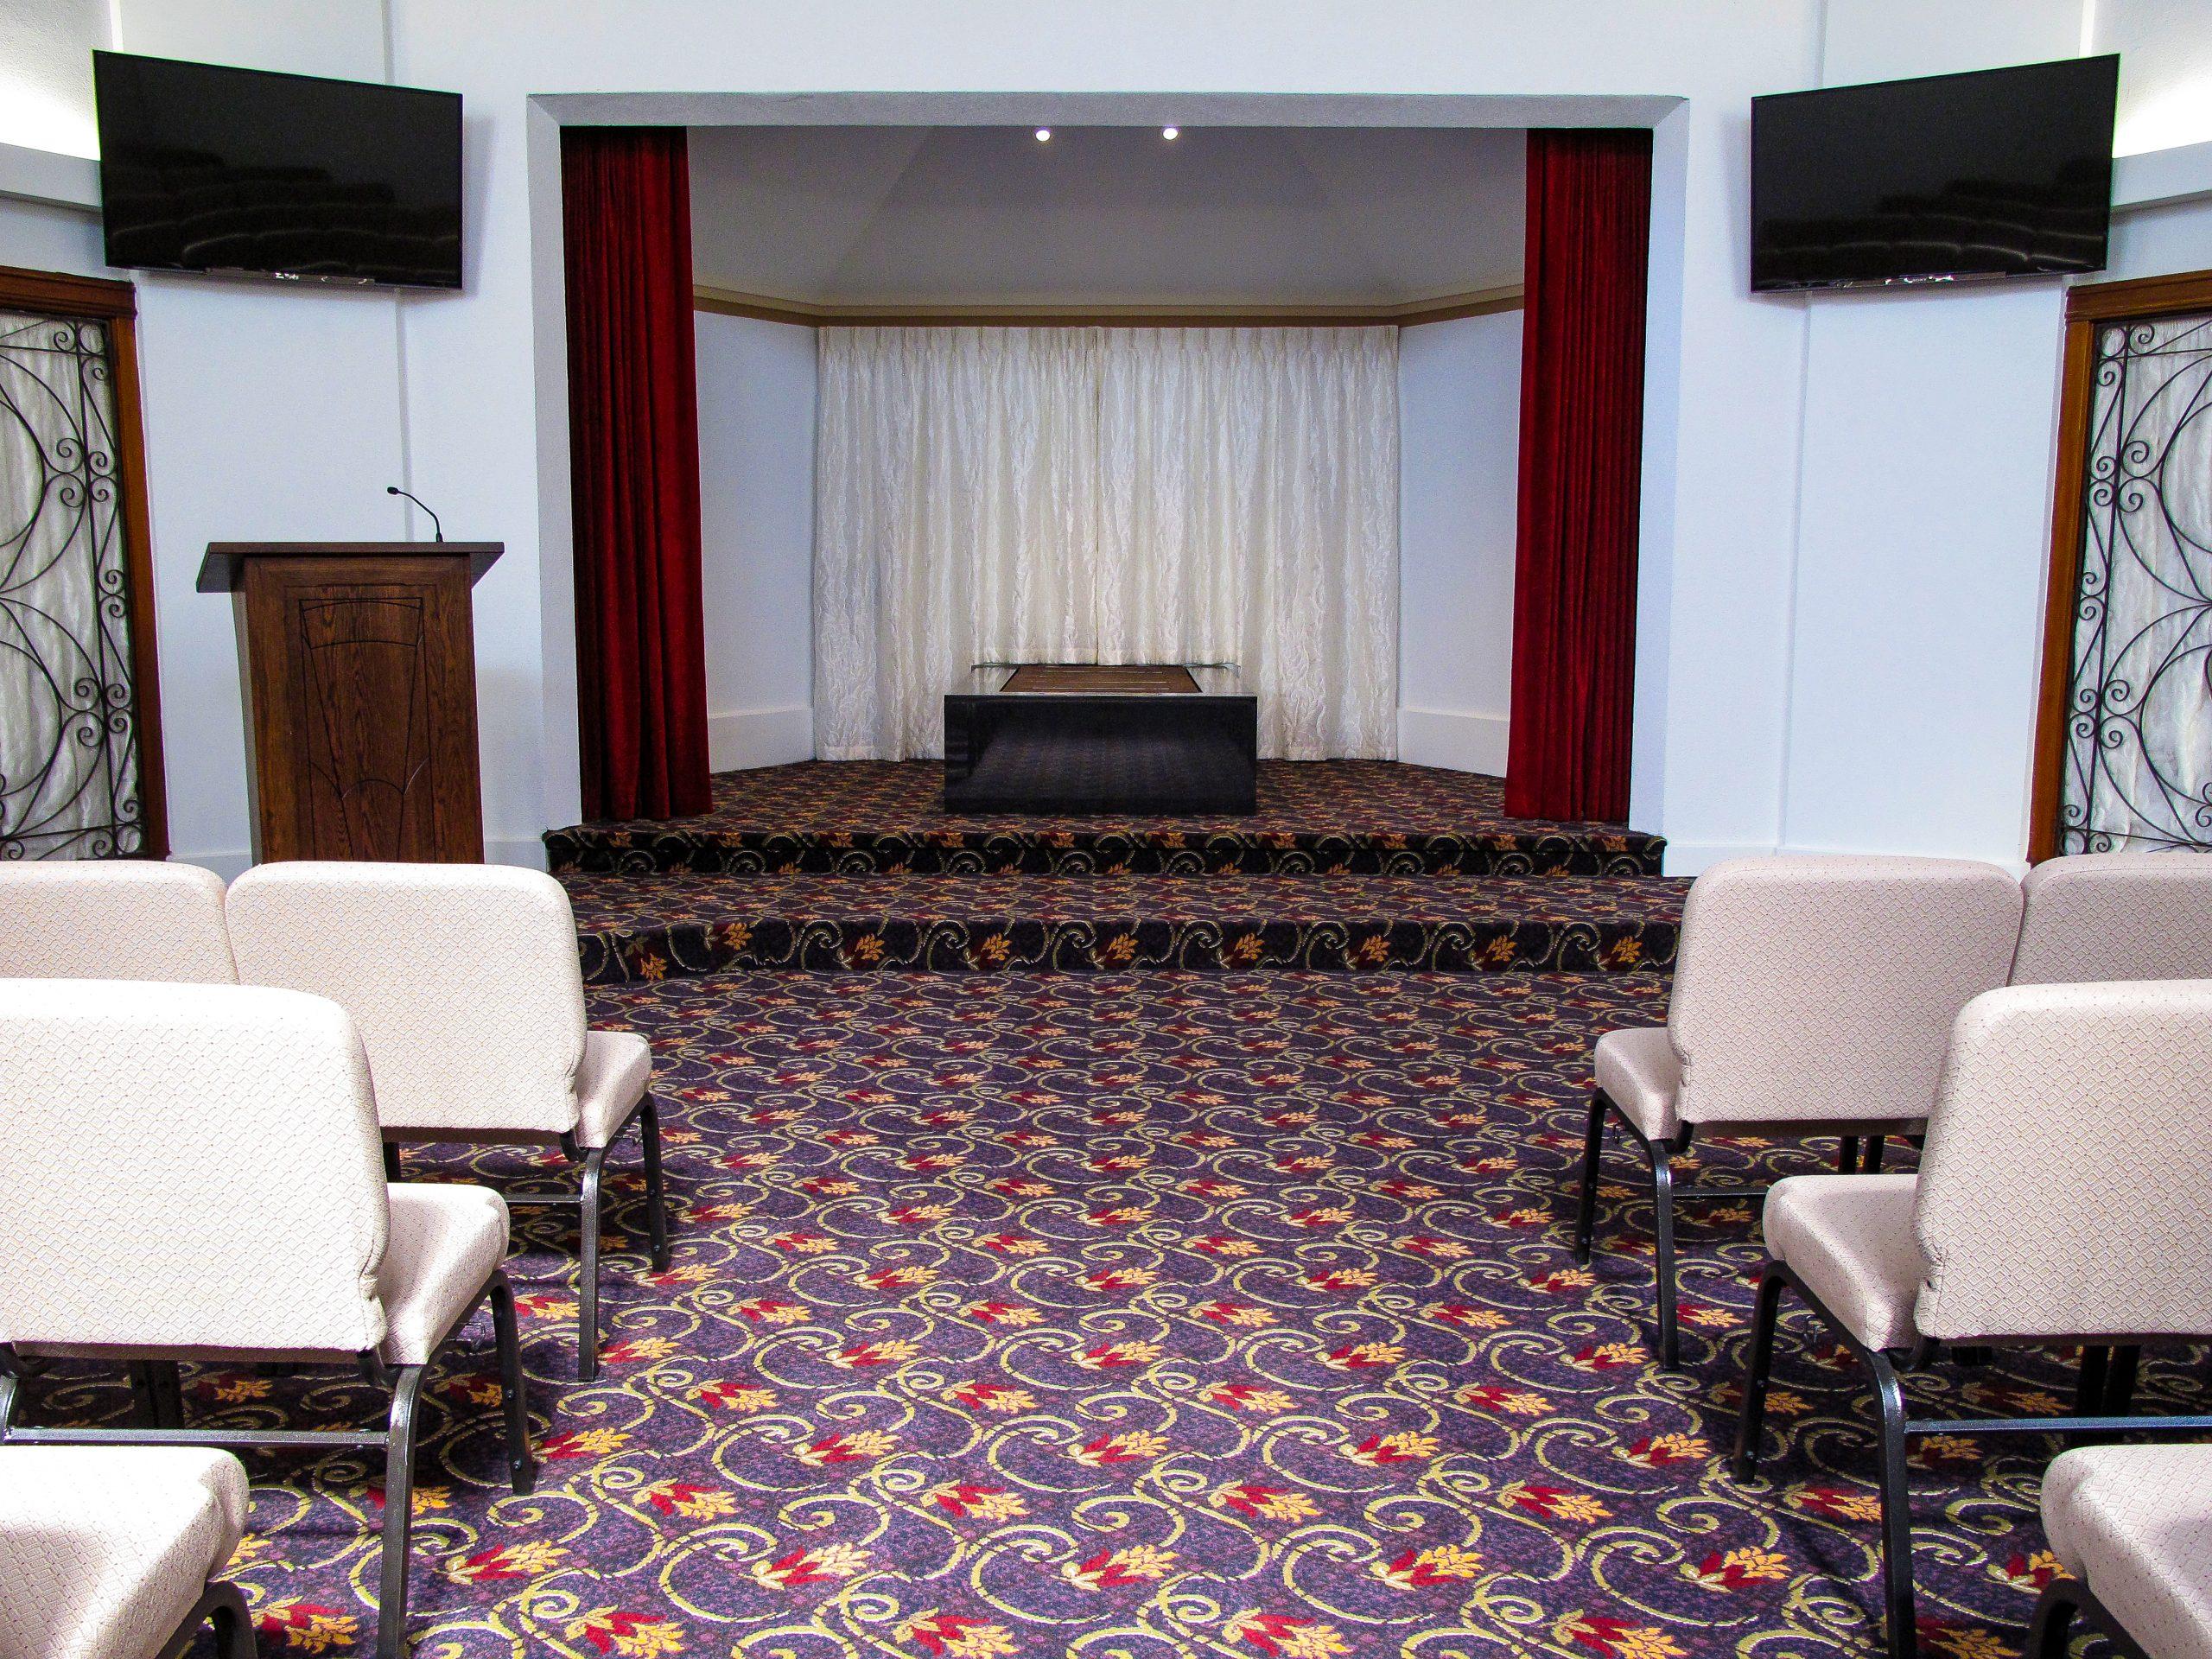 Canterbury Crematorium Inside - Venues | Bell, Lamb & Trotter